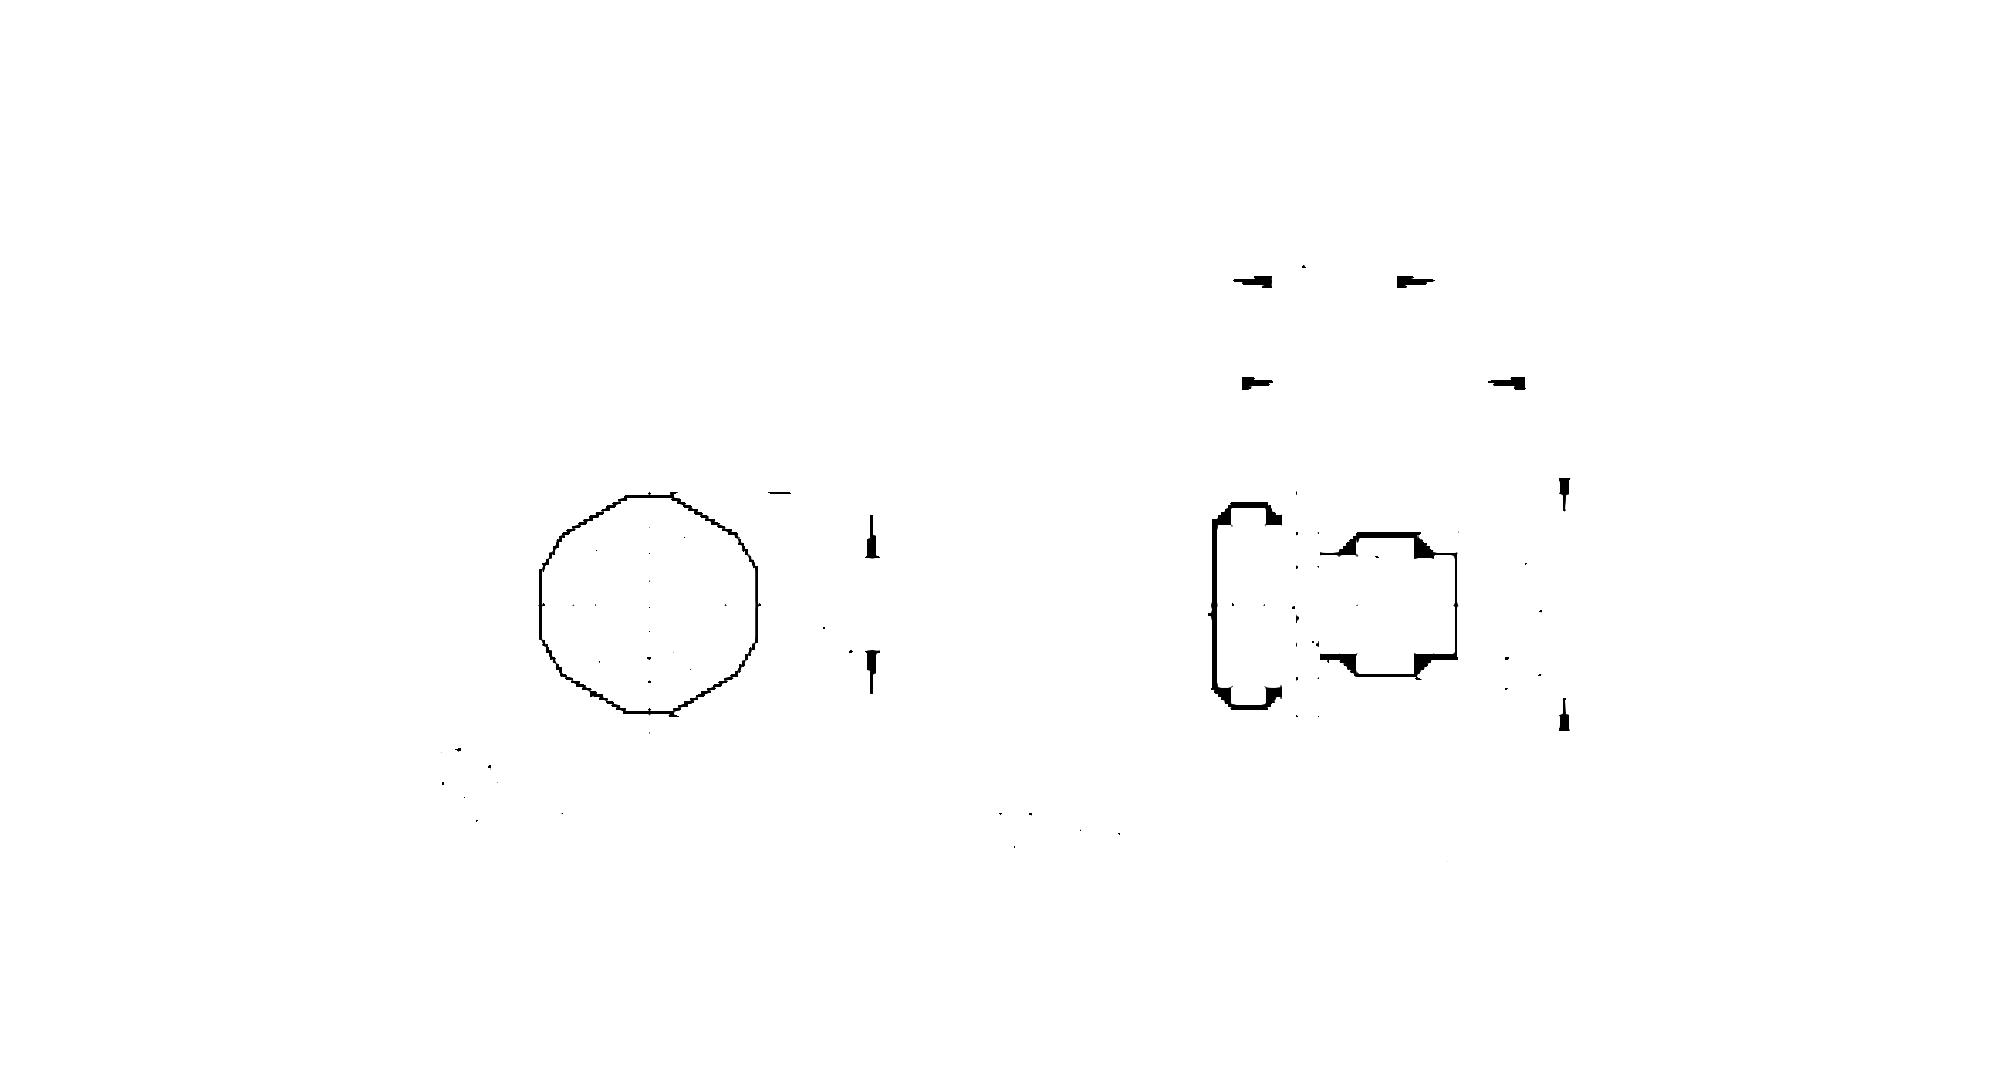 e11588 - male receptacle